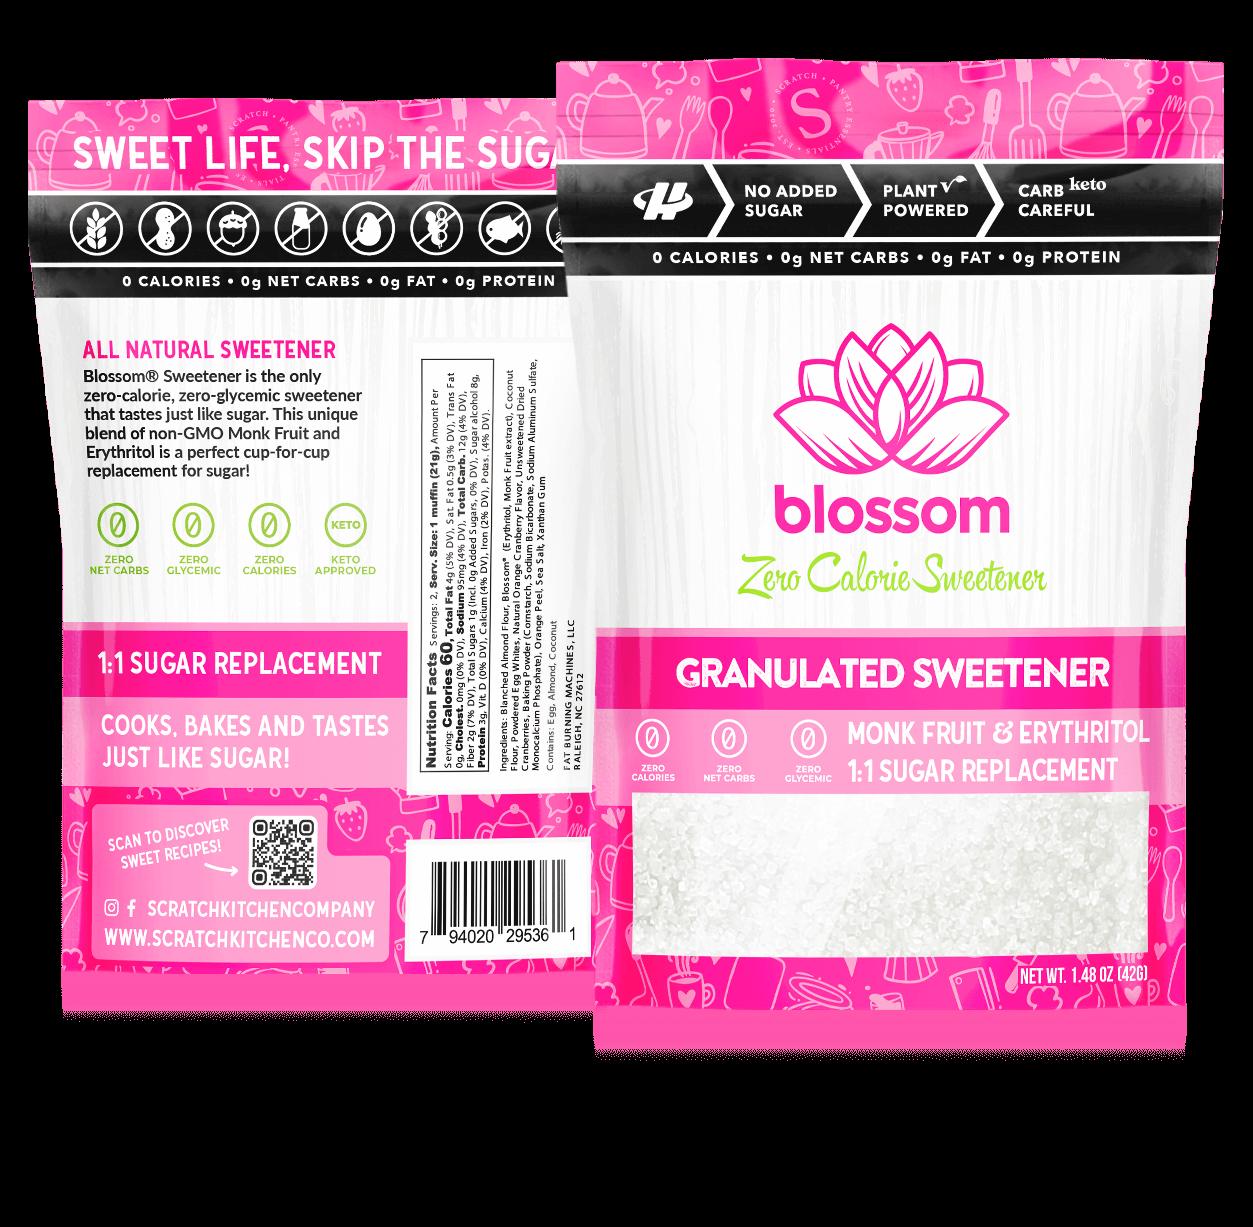 Blossom All Natural Zero Calorie Sweetener